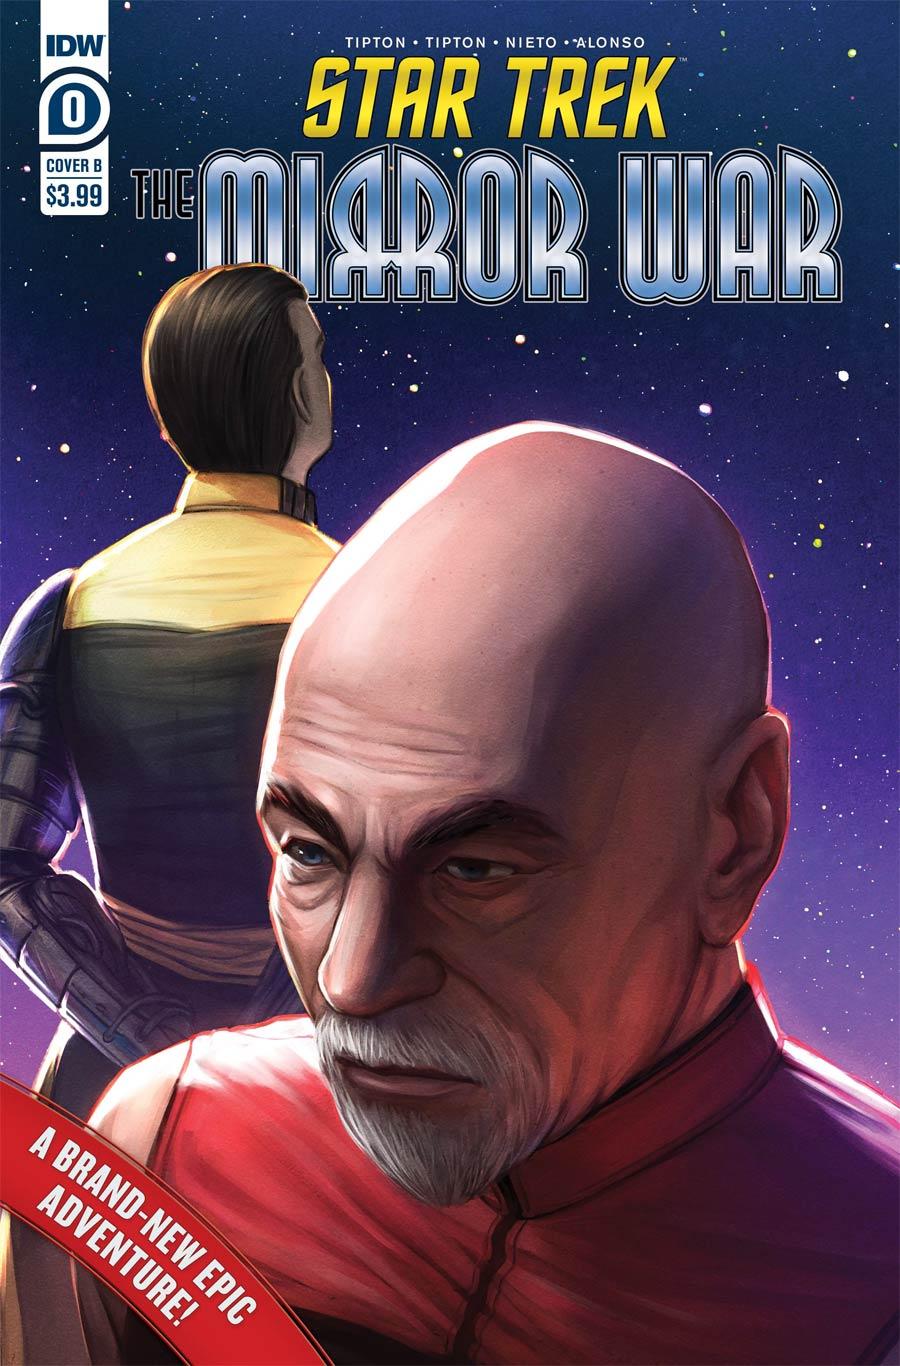 Star Trek The Mirror War #0 Cover B Variant Ejiwa Edge Ebenebe Cover